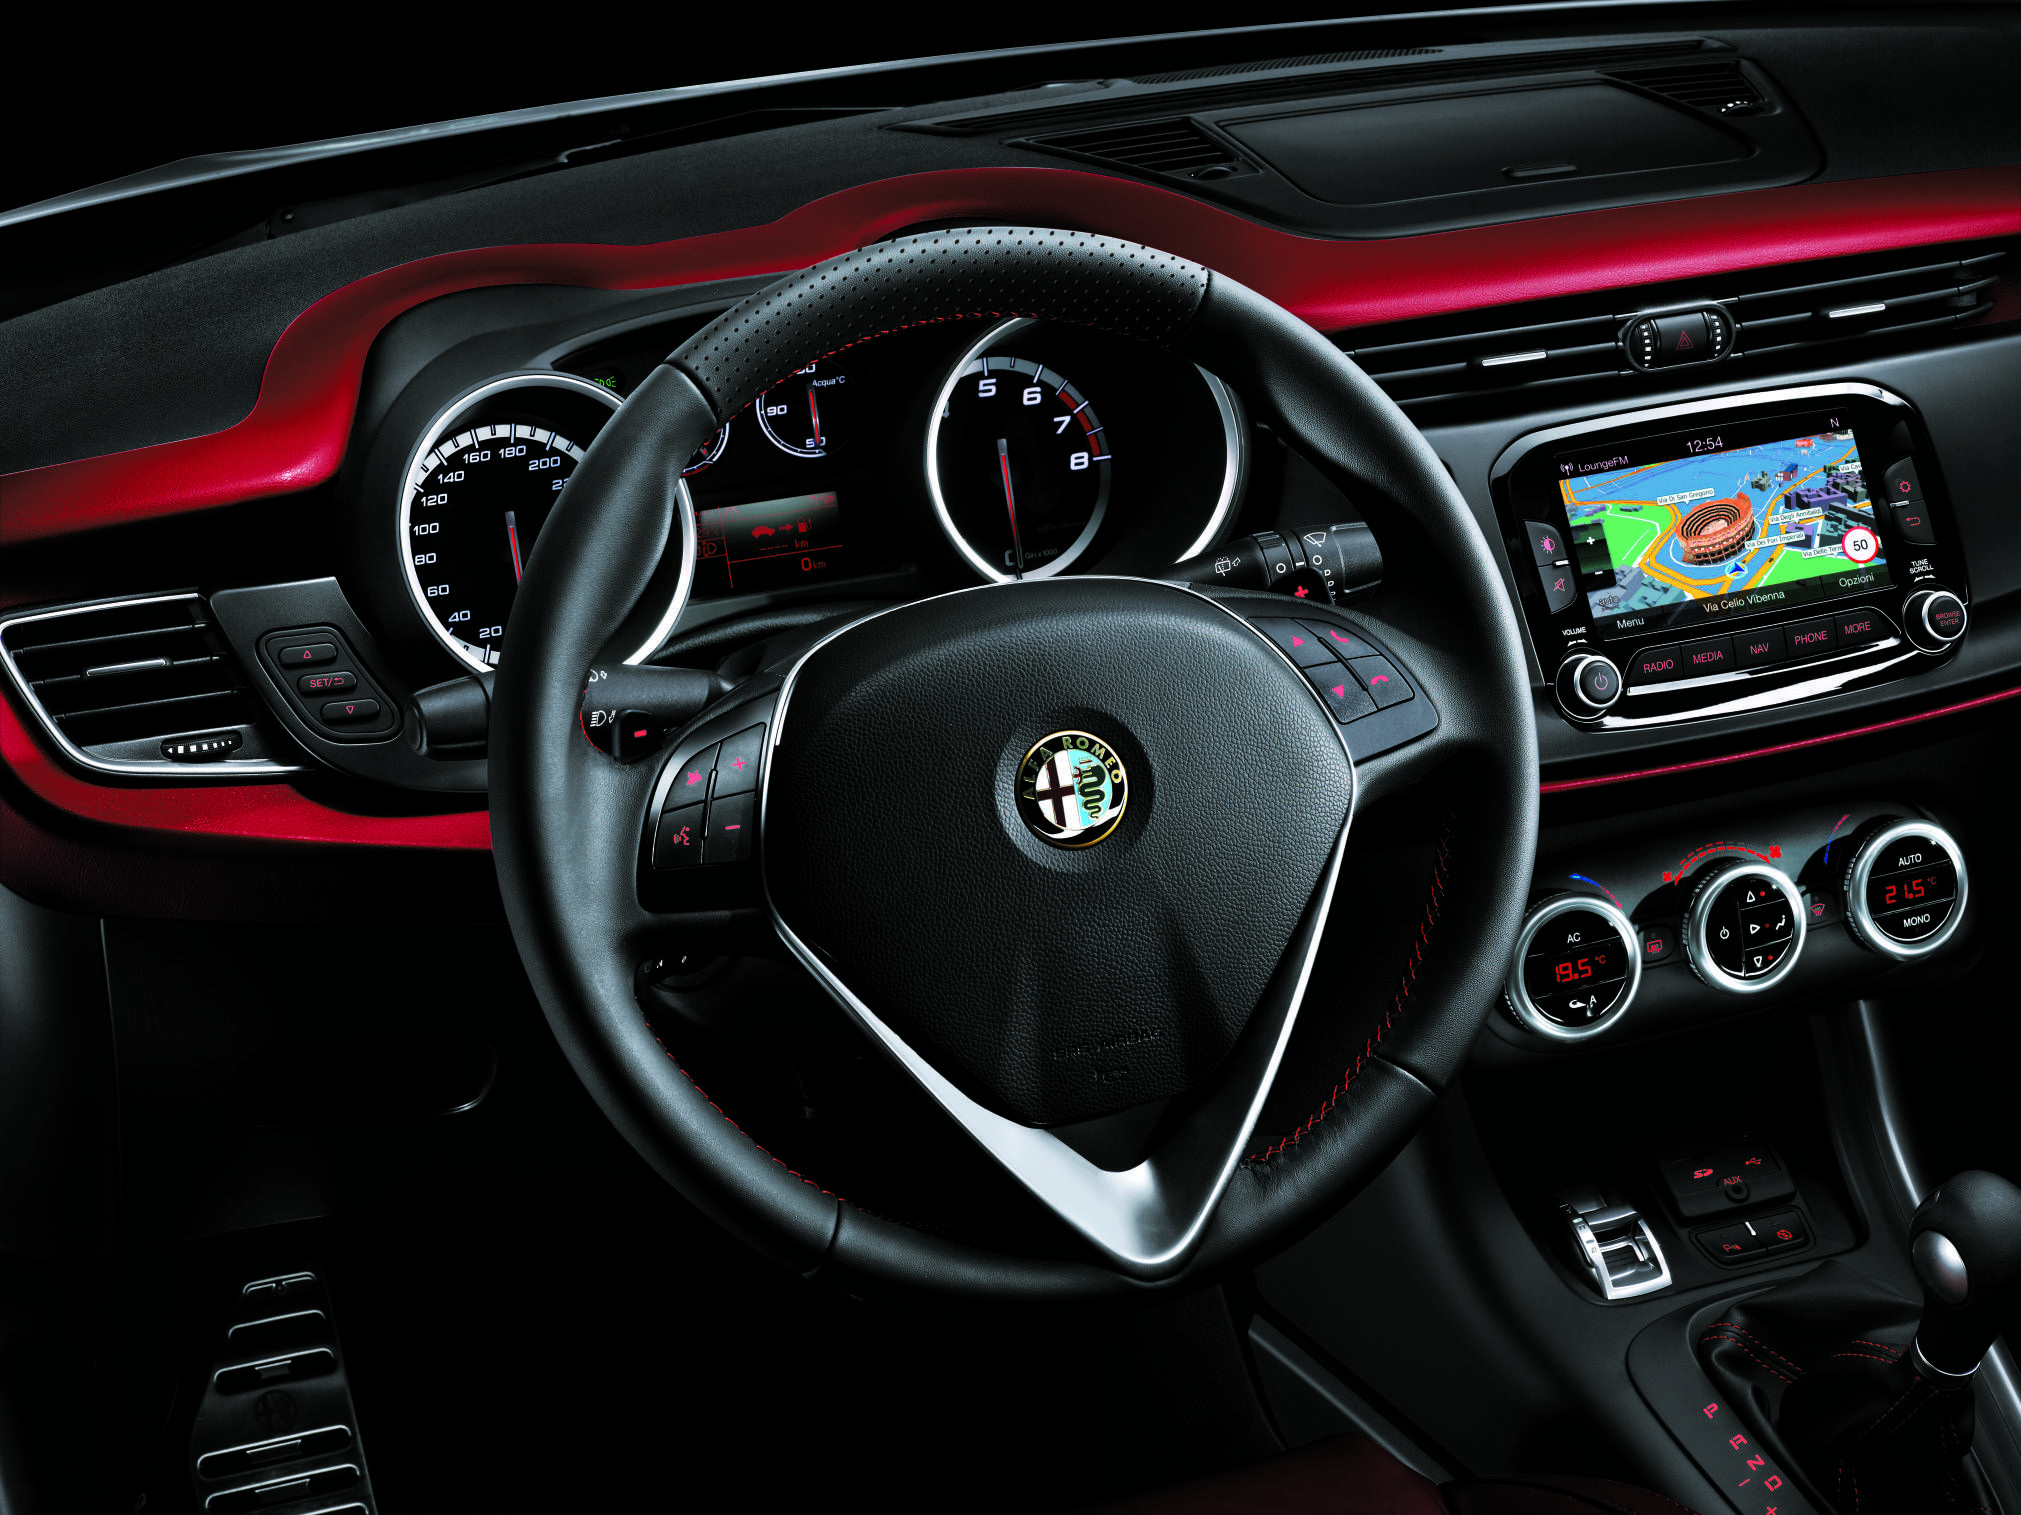 #AlfaRomeo #Giulietta #Cockpit #Innenraum #Interieur #Lenkrad #Alfisti